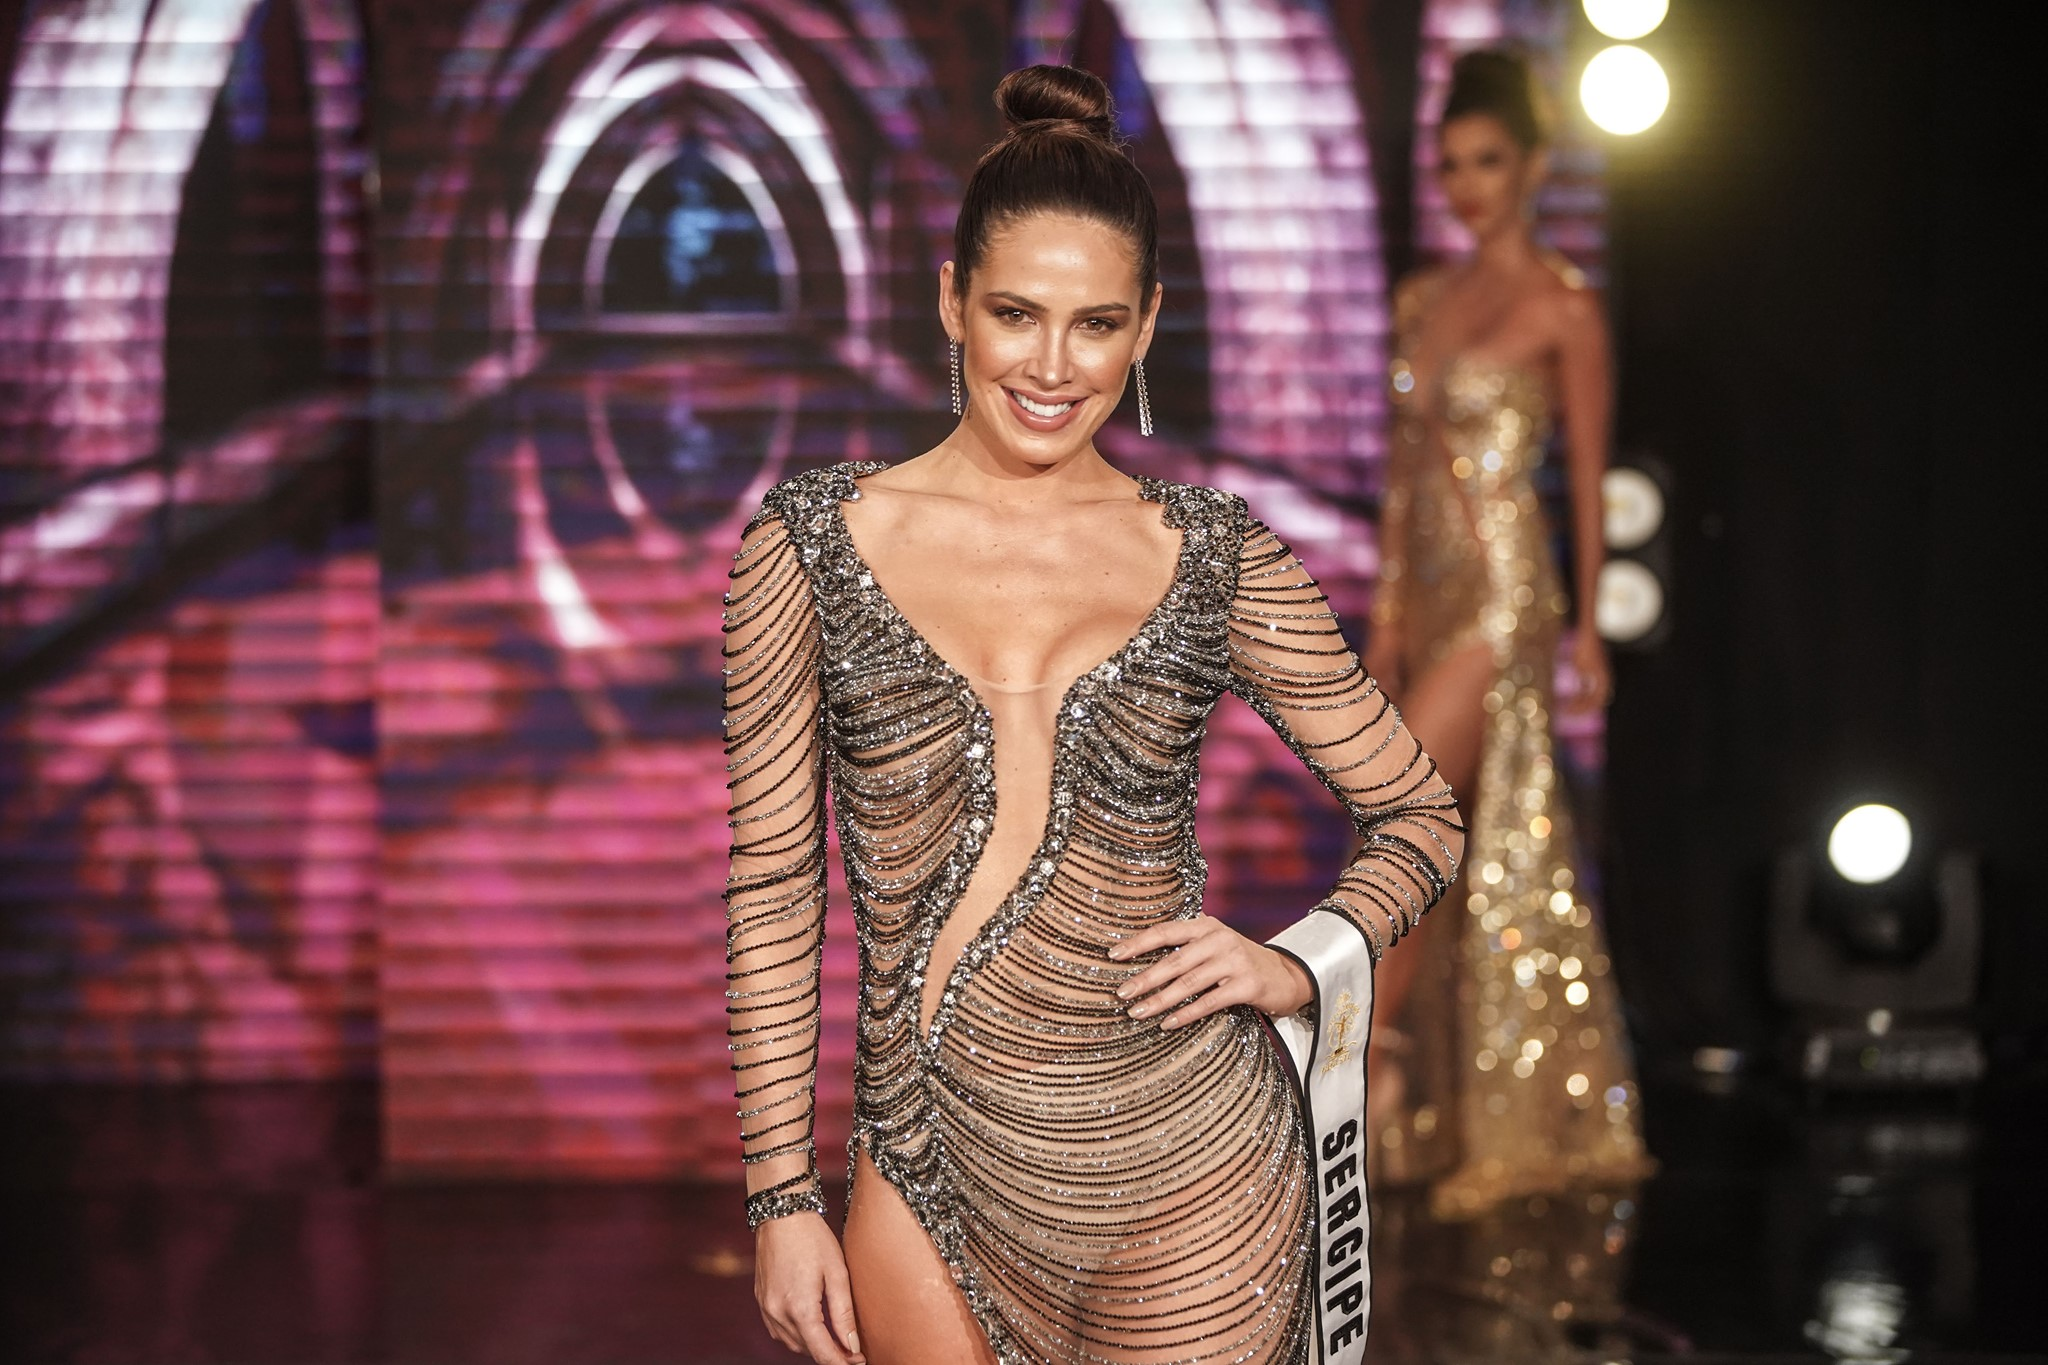 bruna zanardo, 1st runner-up de miss supranational brazil 2020/miss brasil internacional 2017/miss brasil terra 2016. - Página 19 12961210